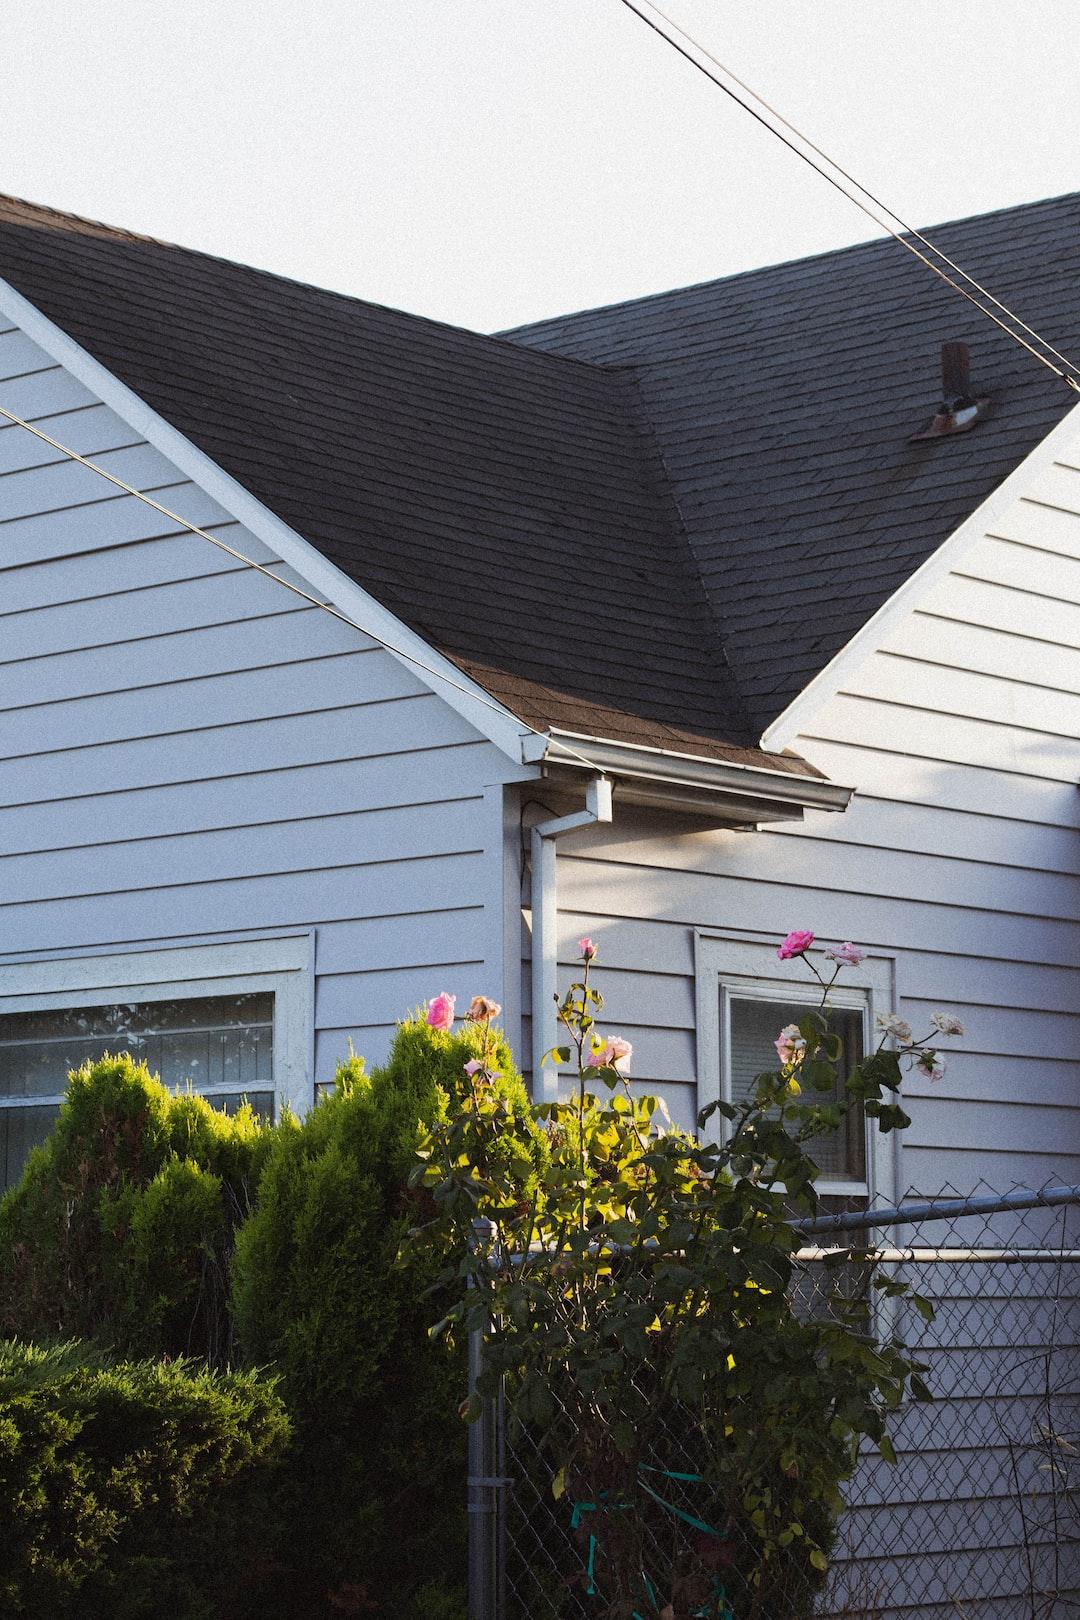 3 Roof Maintenance Warning Signs